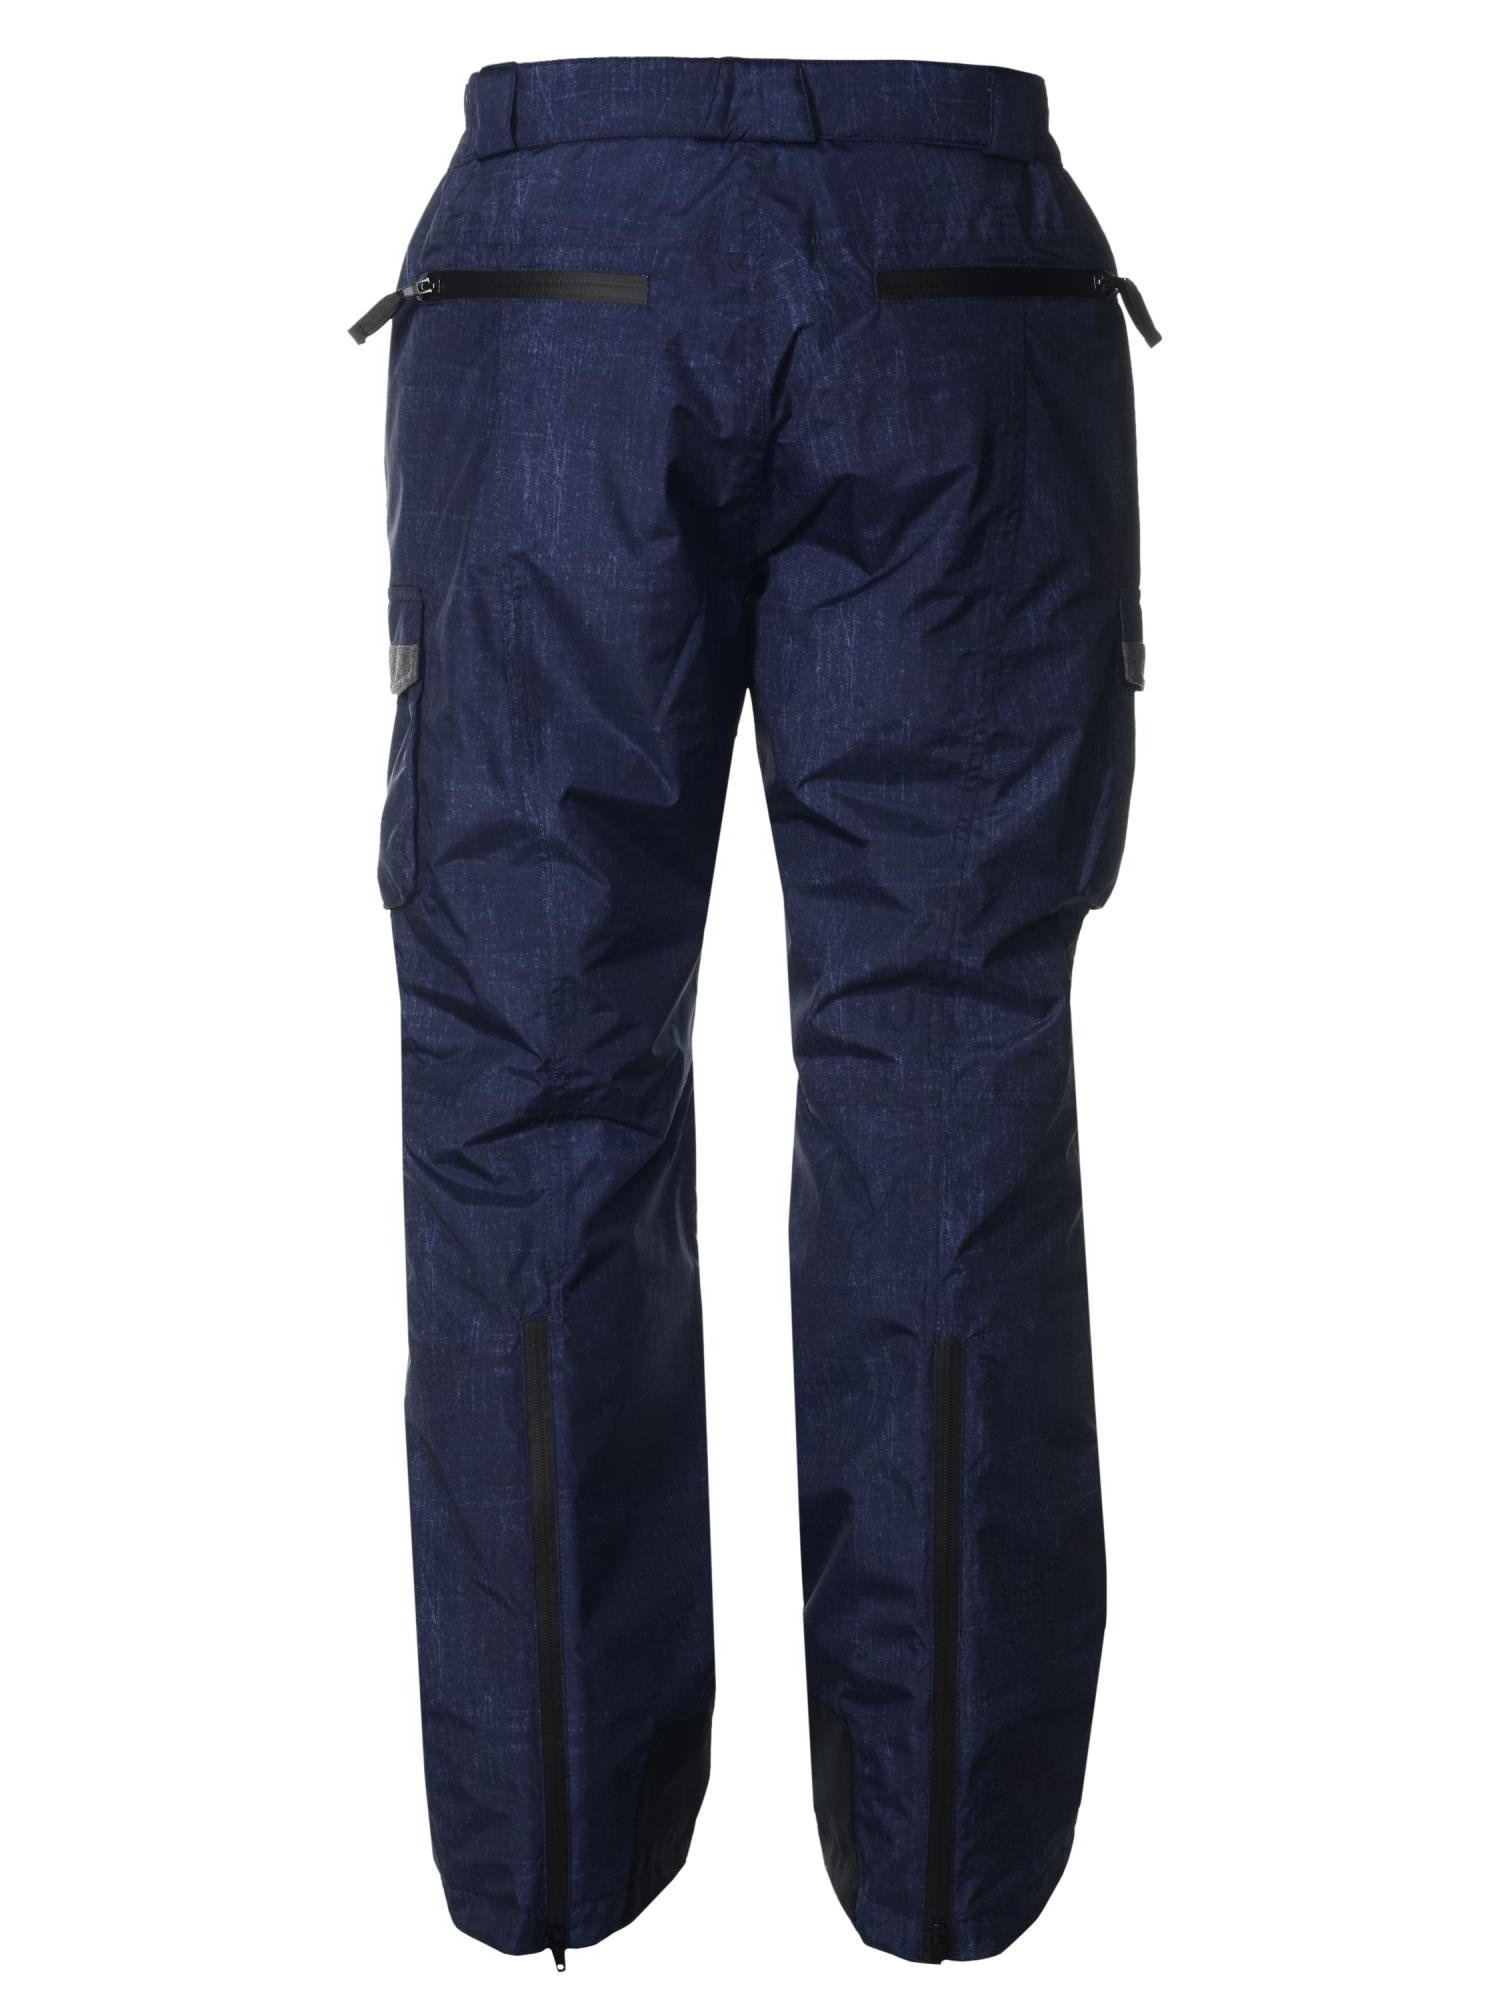 Мужская горнолыжная одежда Almrausch Staad-Hochbruck 320103-321300 джинс